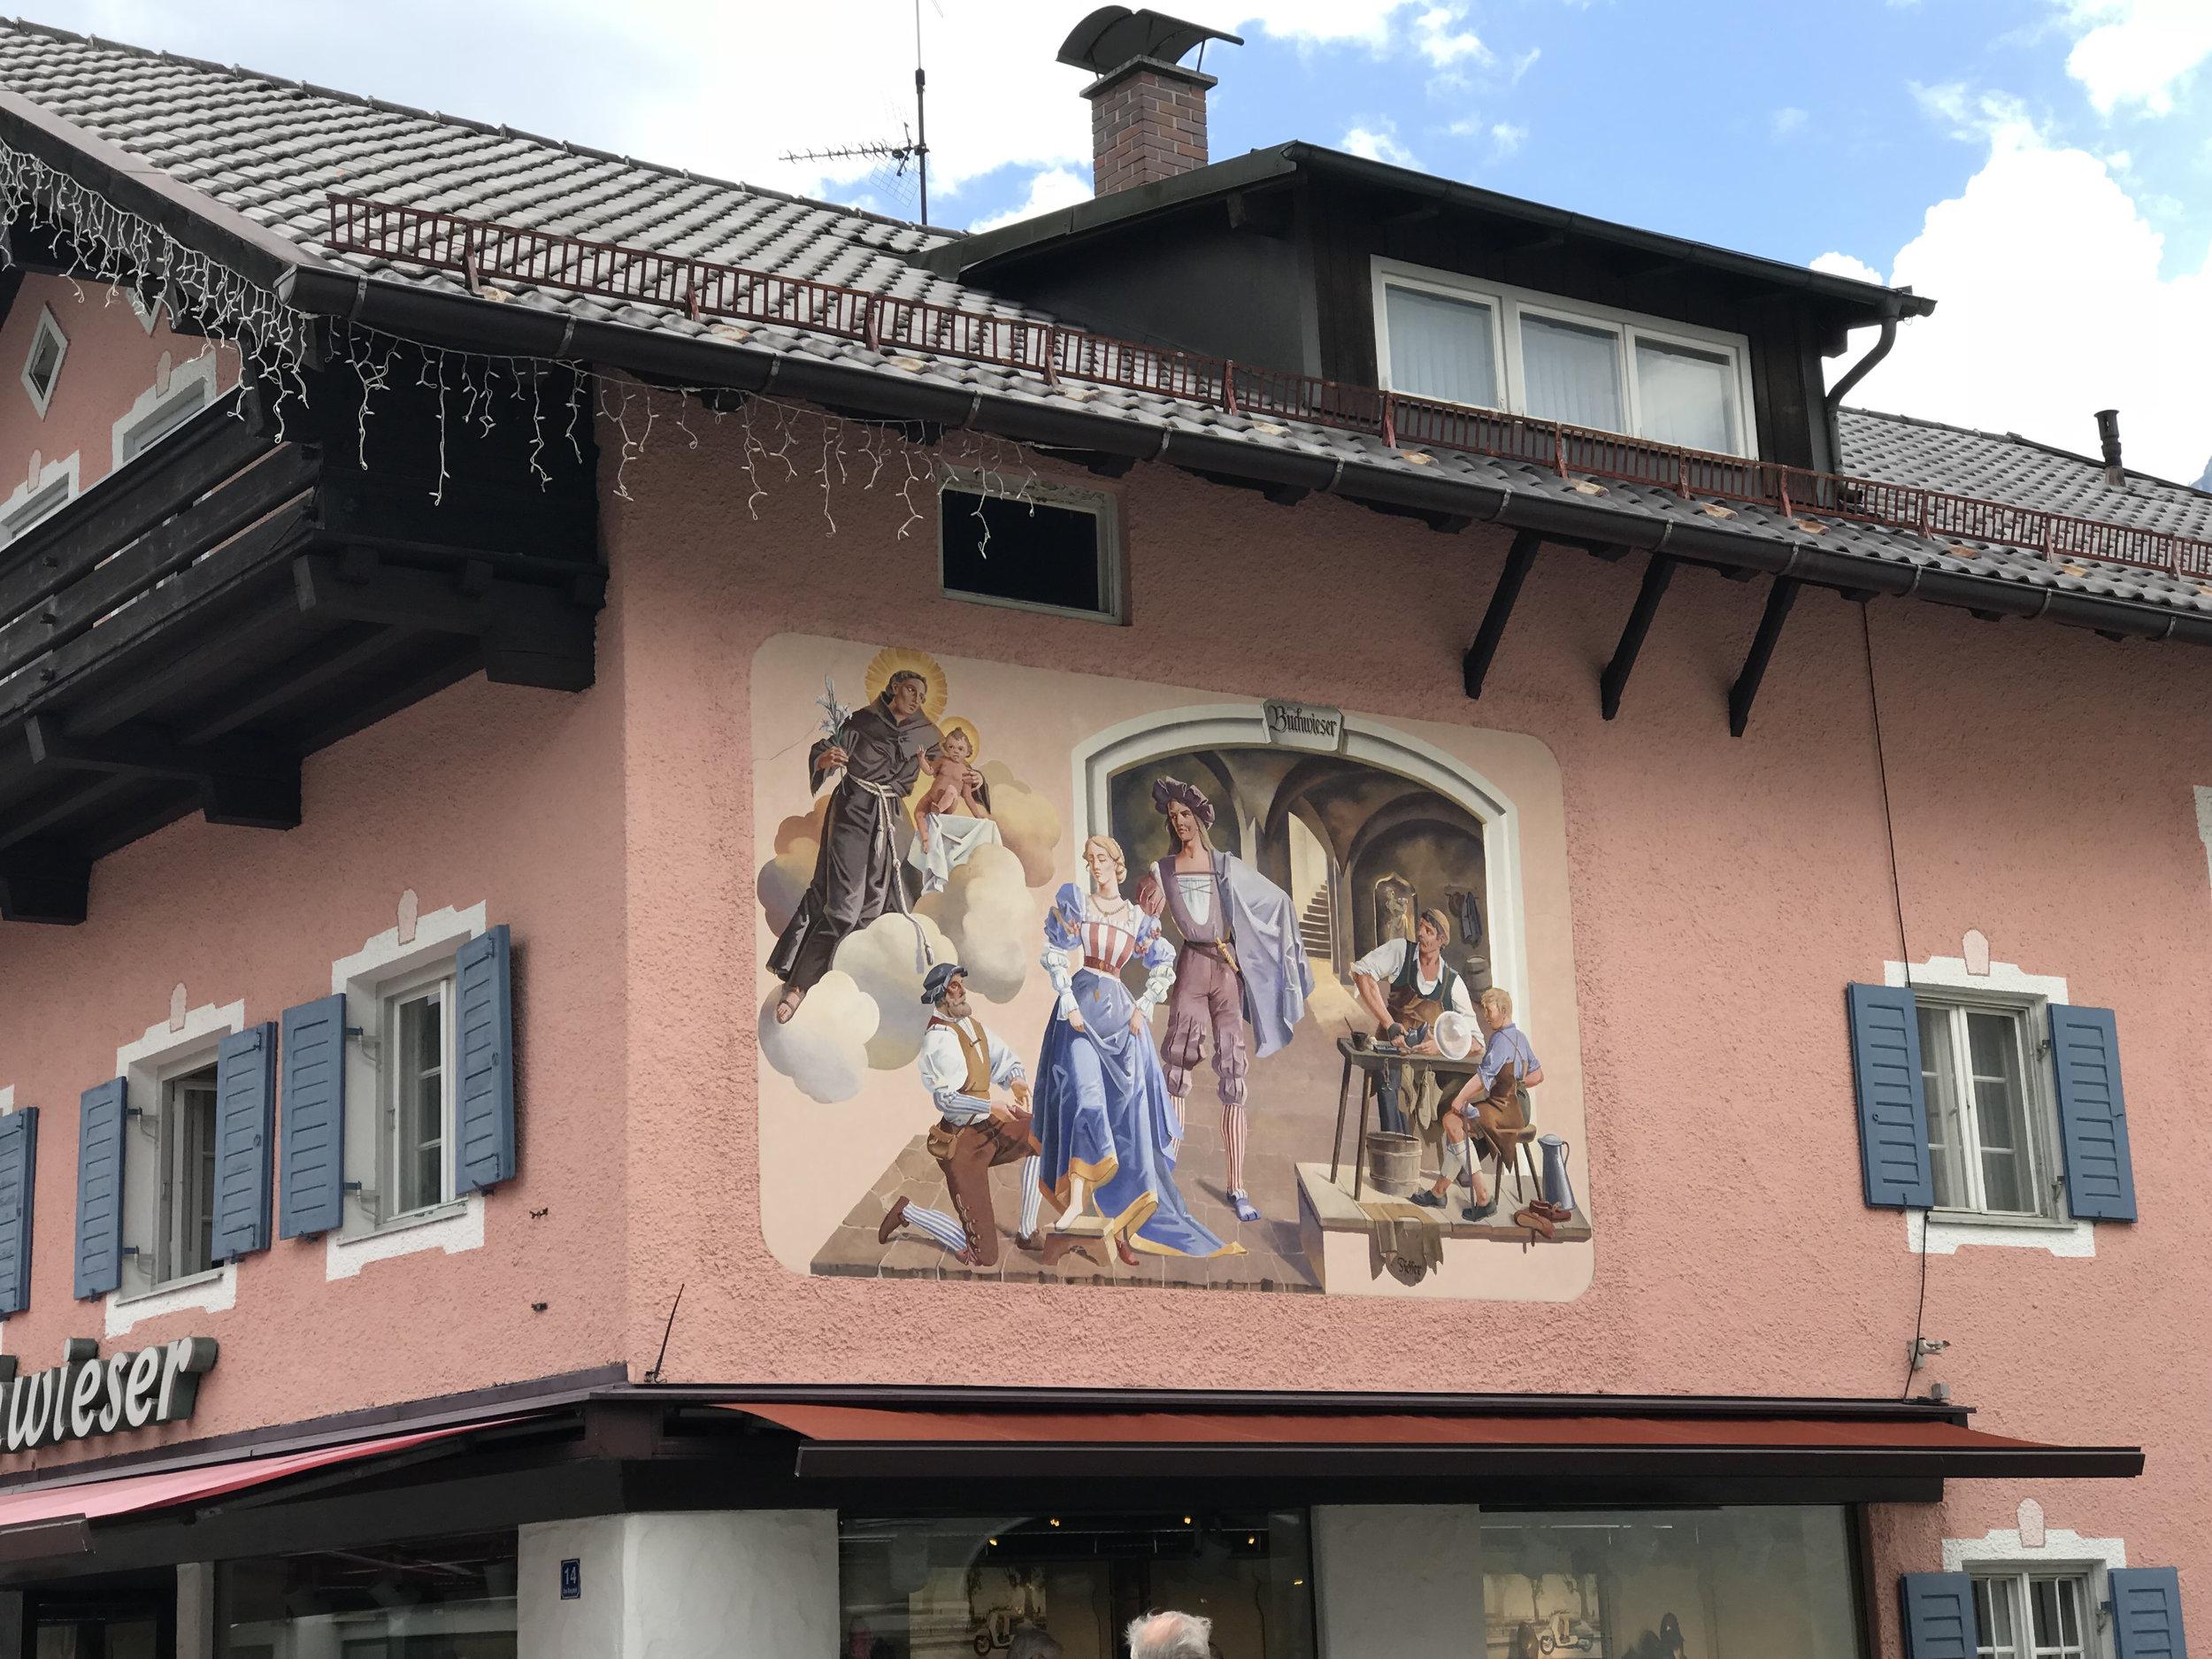 Teri_Bavaria_part3_spiritedtable_photo04.jpg